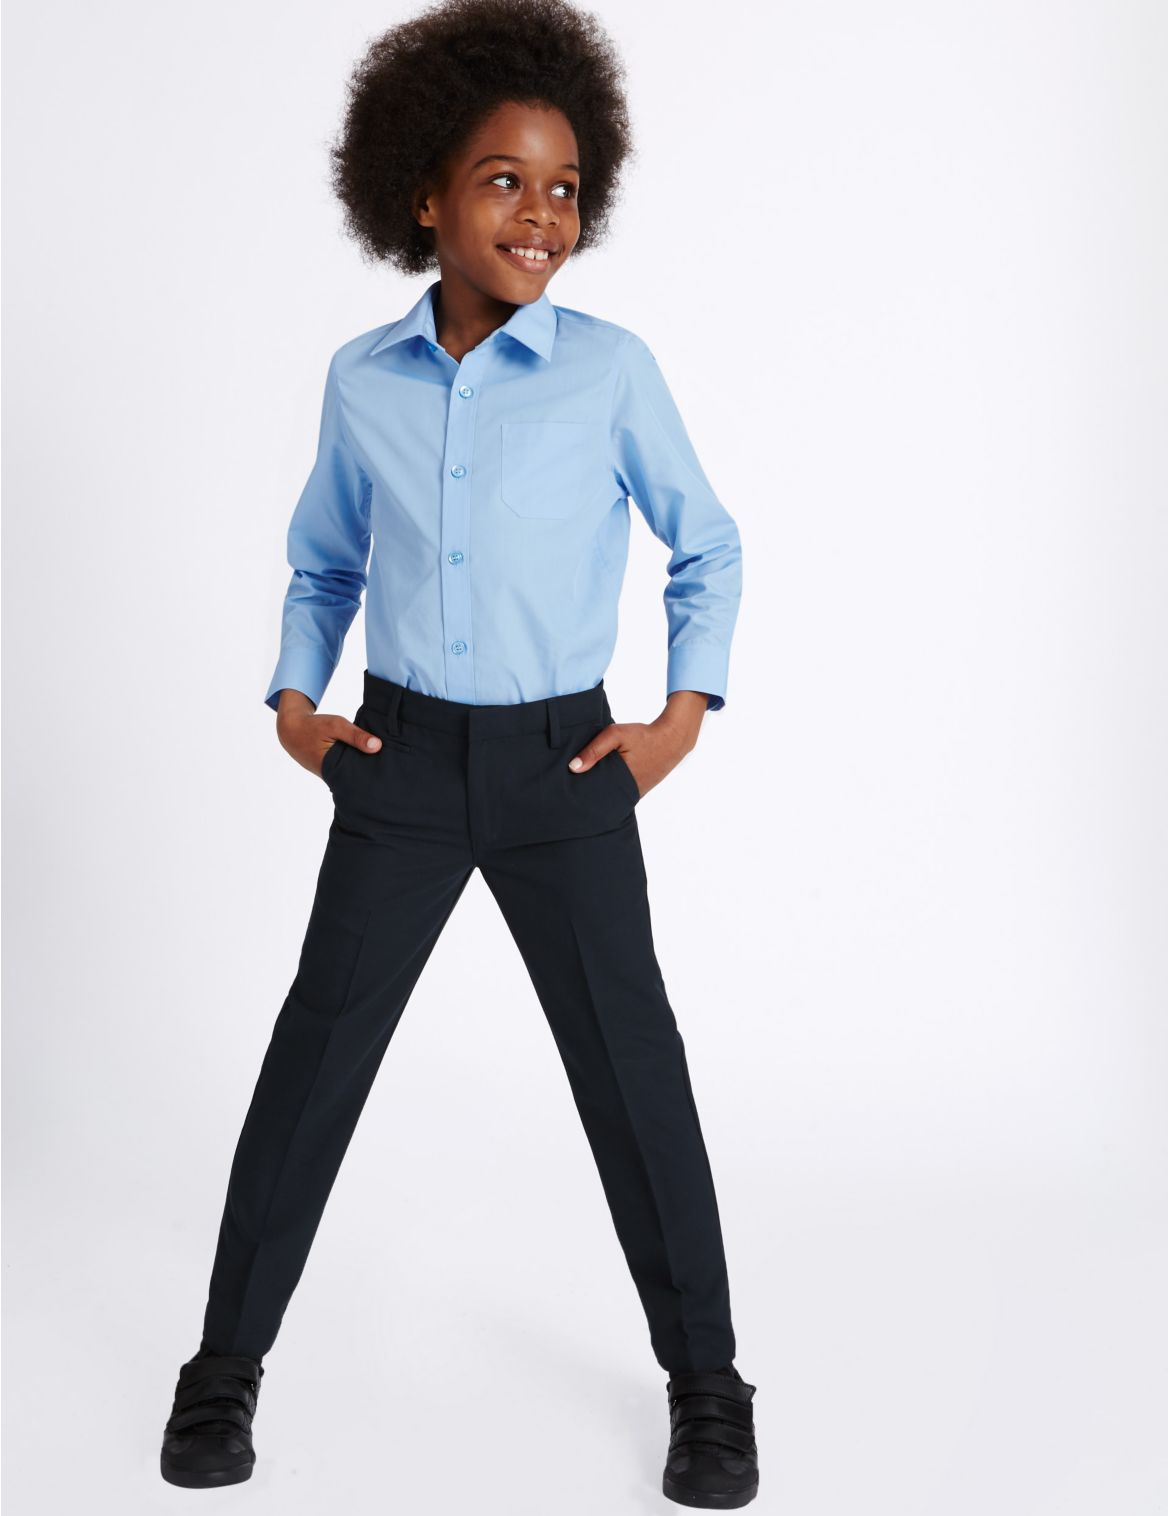 Pantalon jeune homme coupe skinny. StyleForme du produit:Pantalons;Coupe:Coupe standard;Style pantalon:Sans pinces